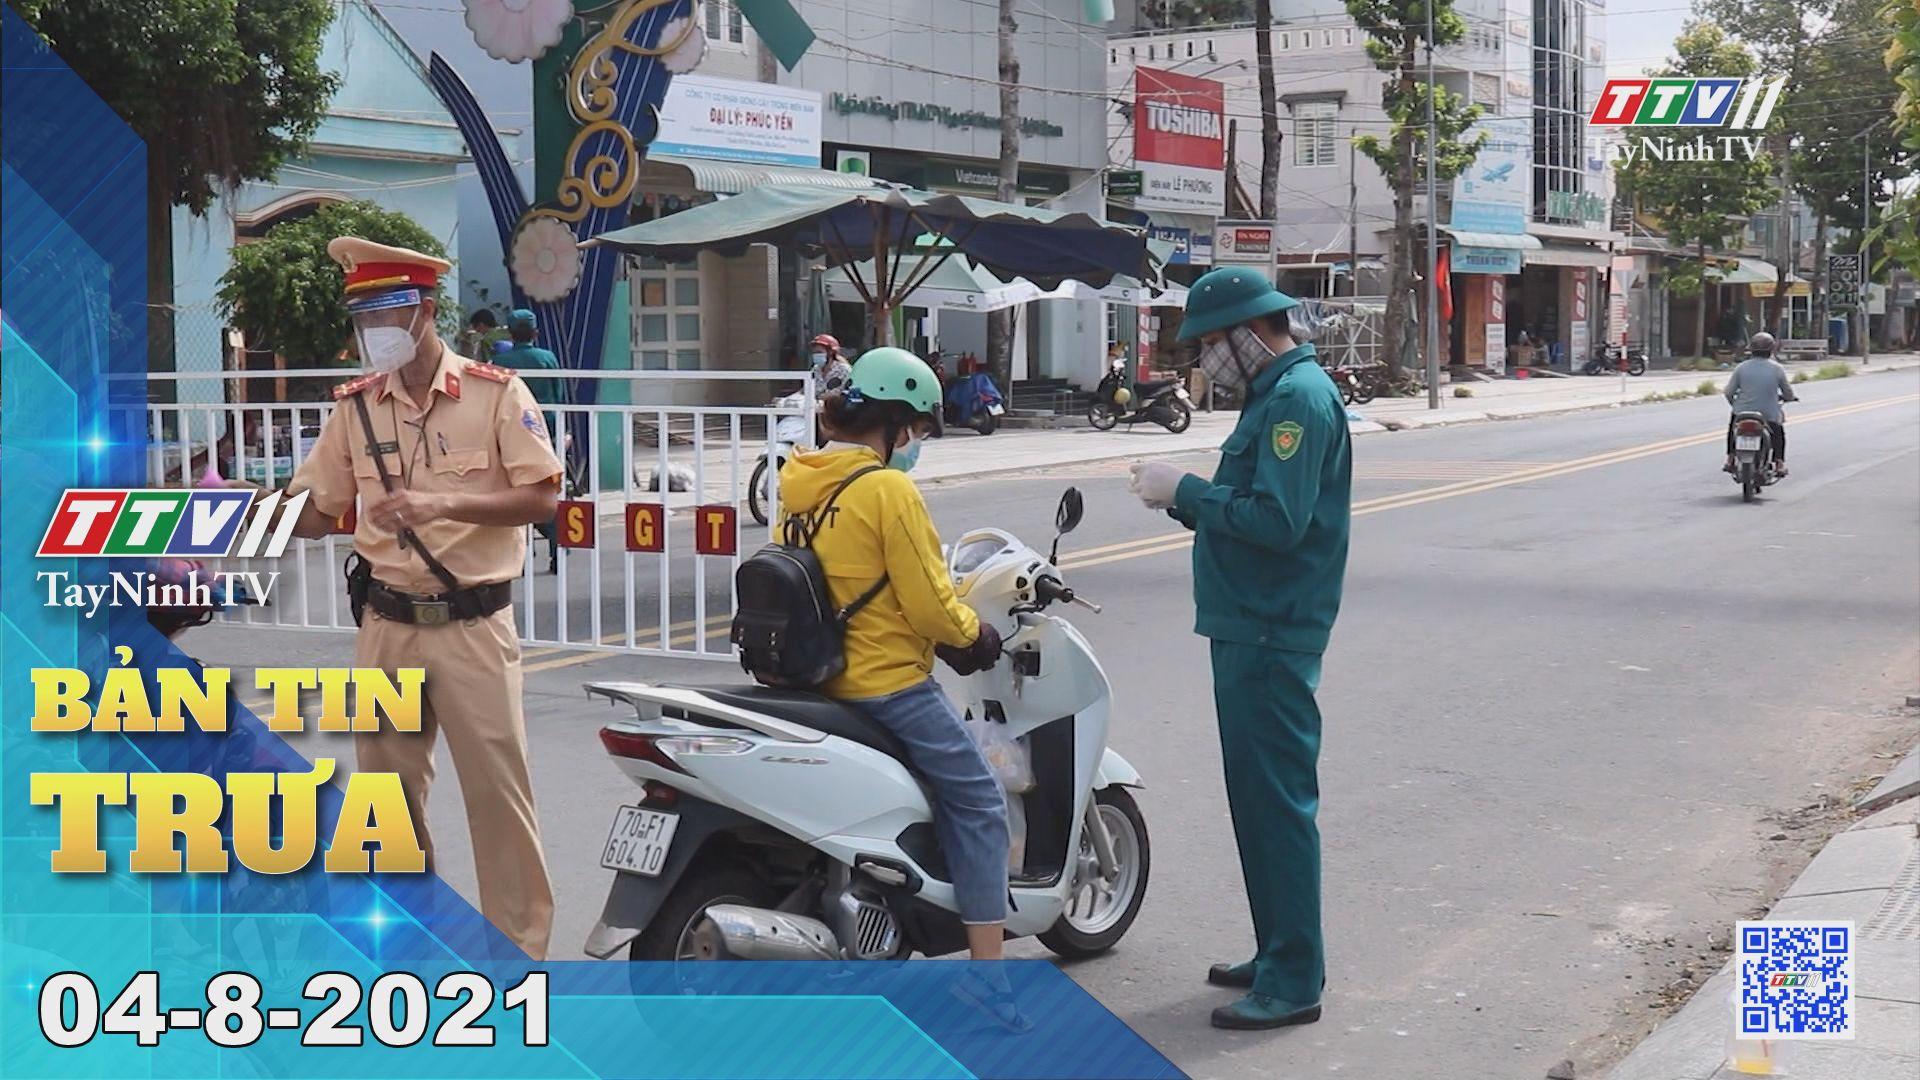 Bản tin trưa 04-8-2021 | Tin tức hôm nay | TayNinhTV